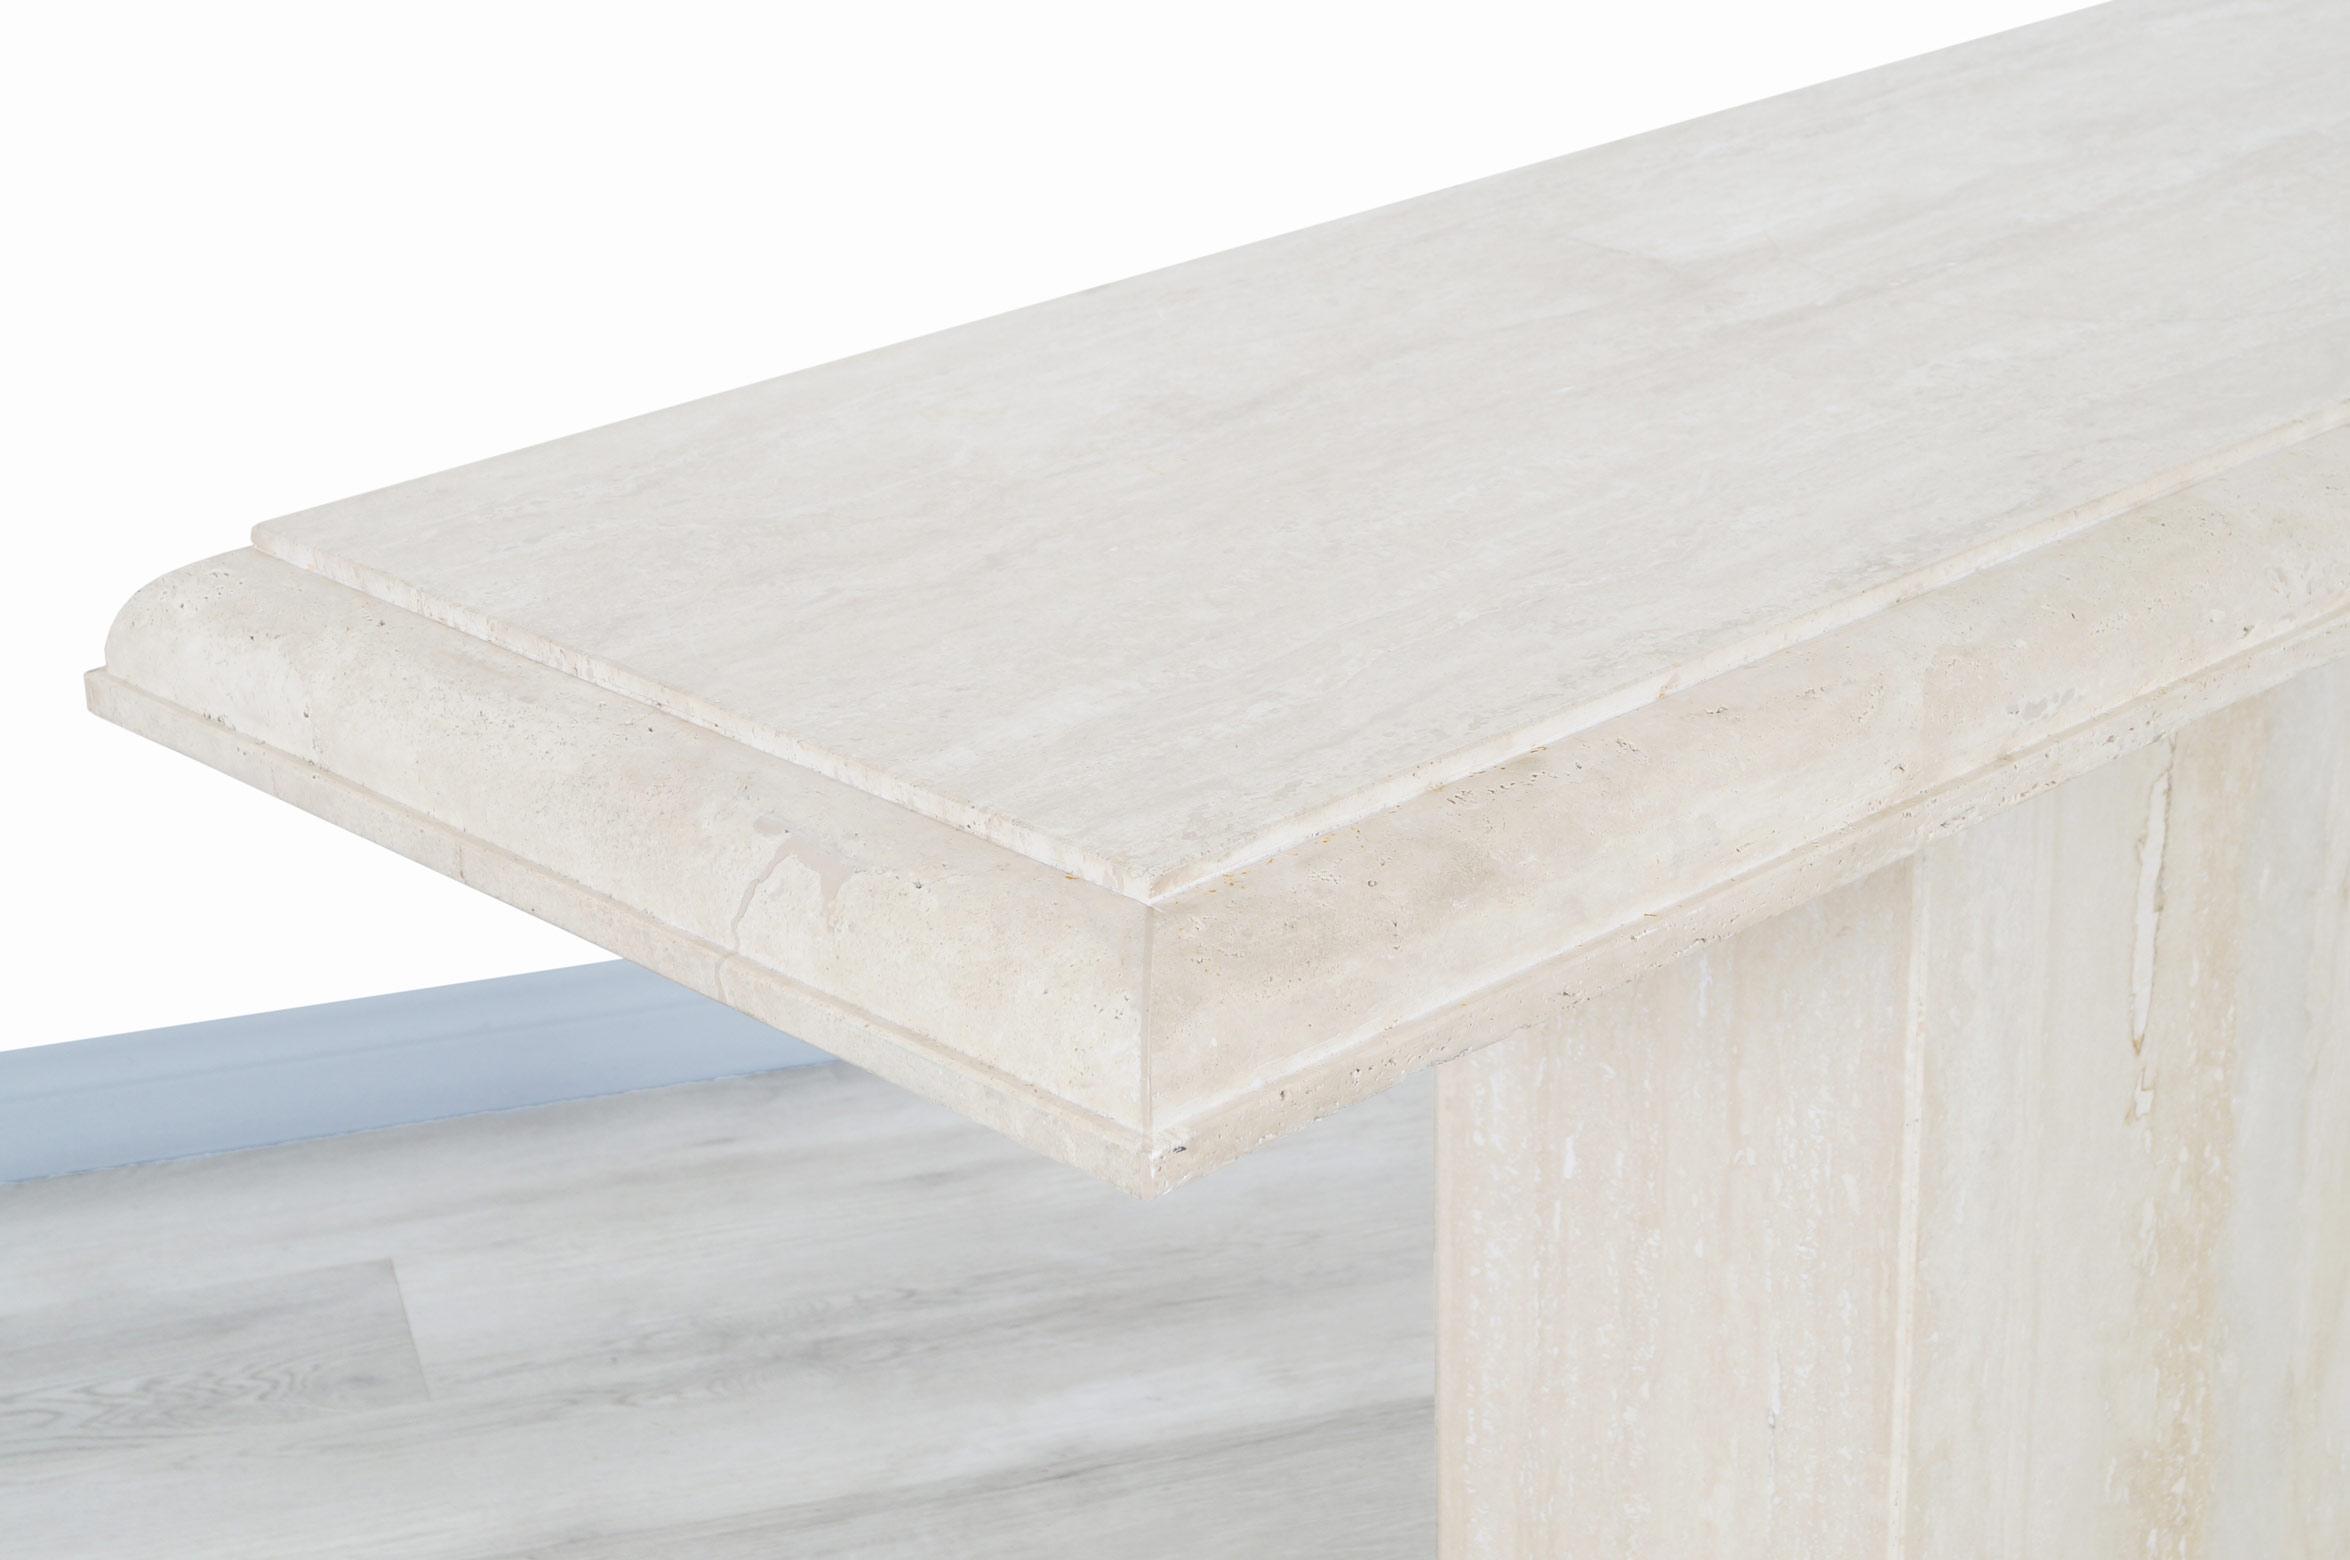 Italian Modernist Travertine Console Table